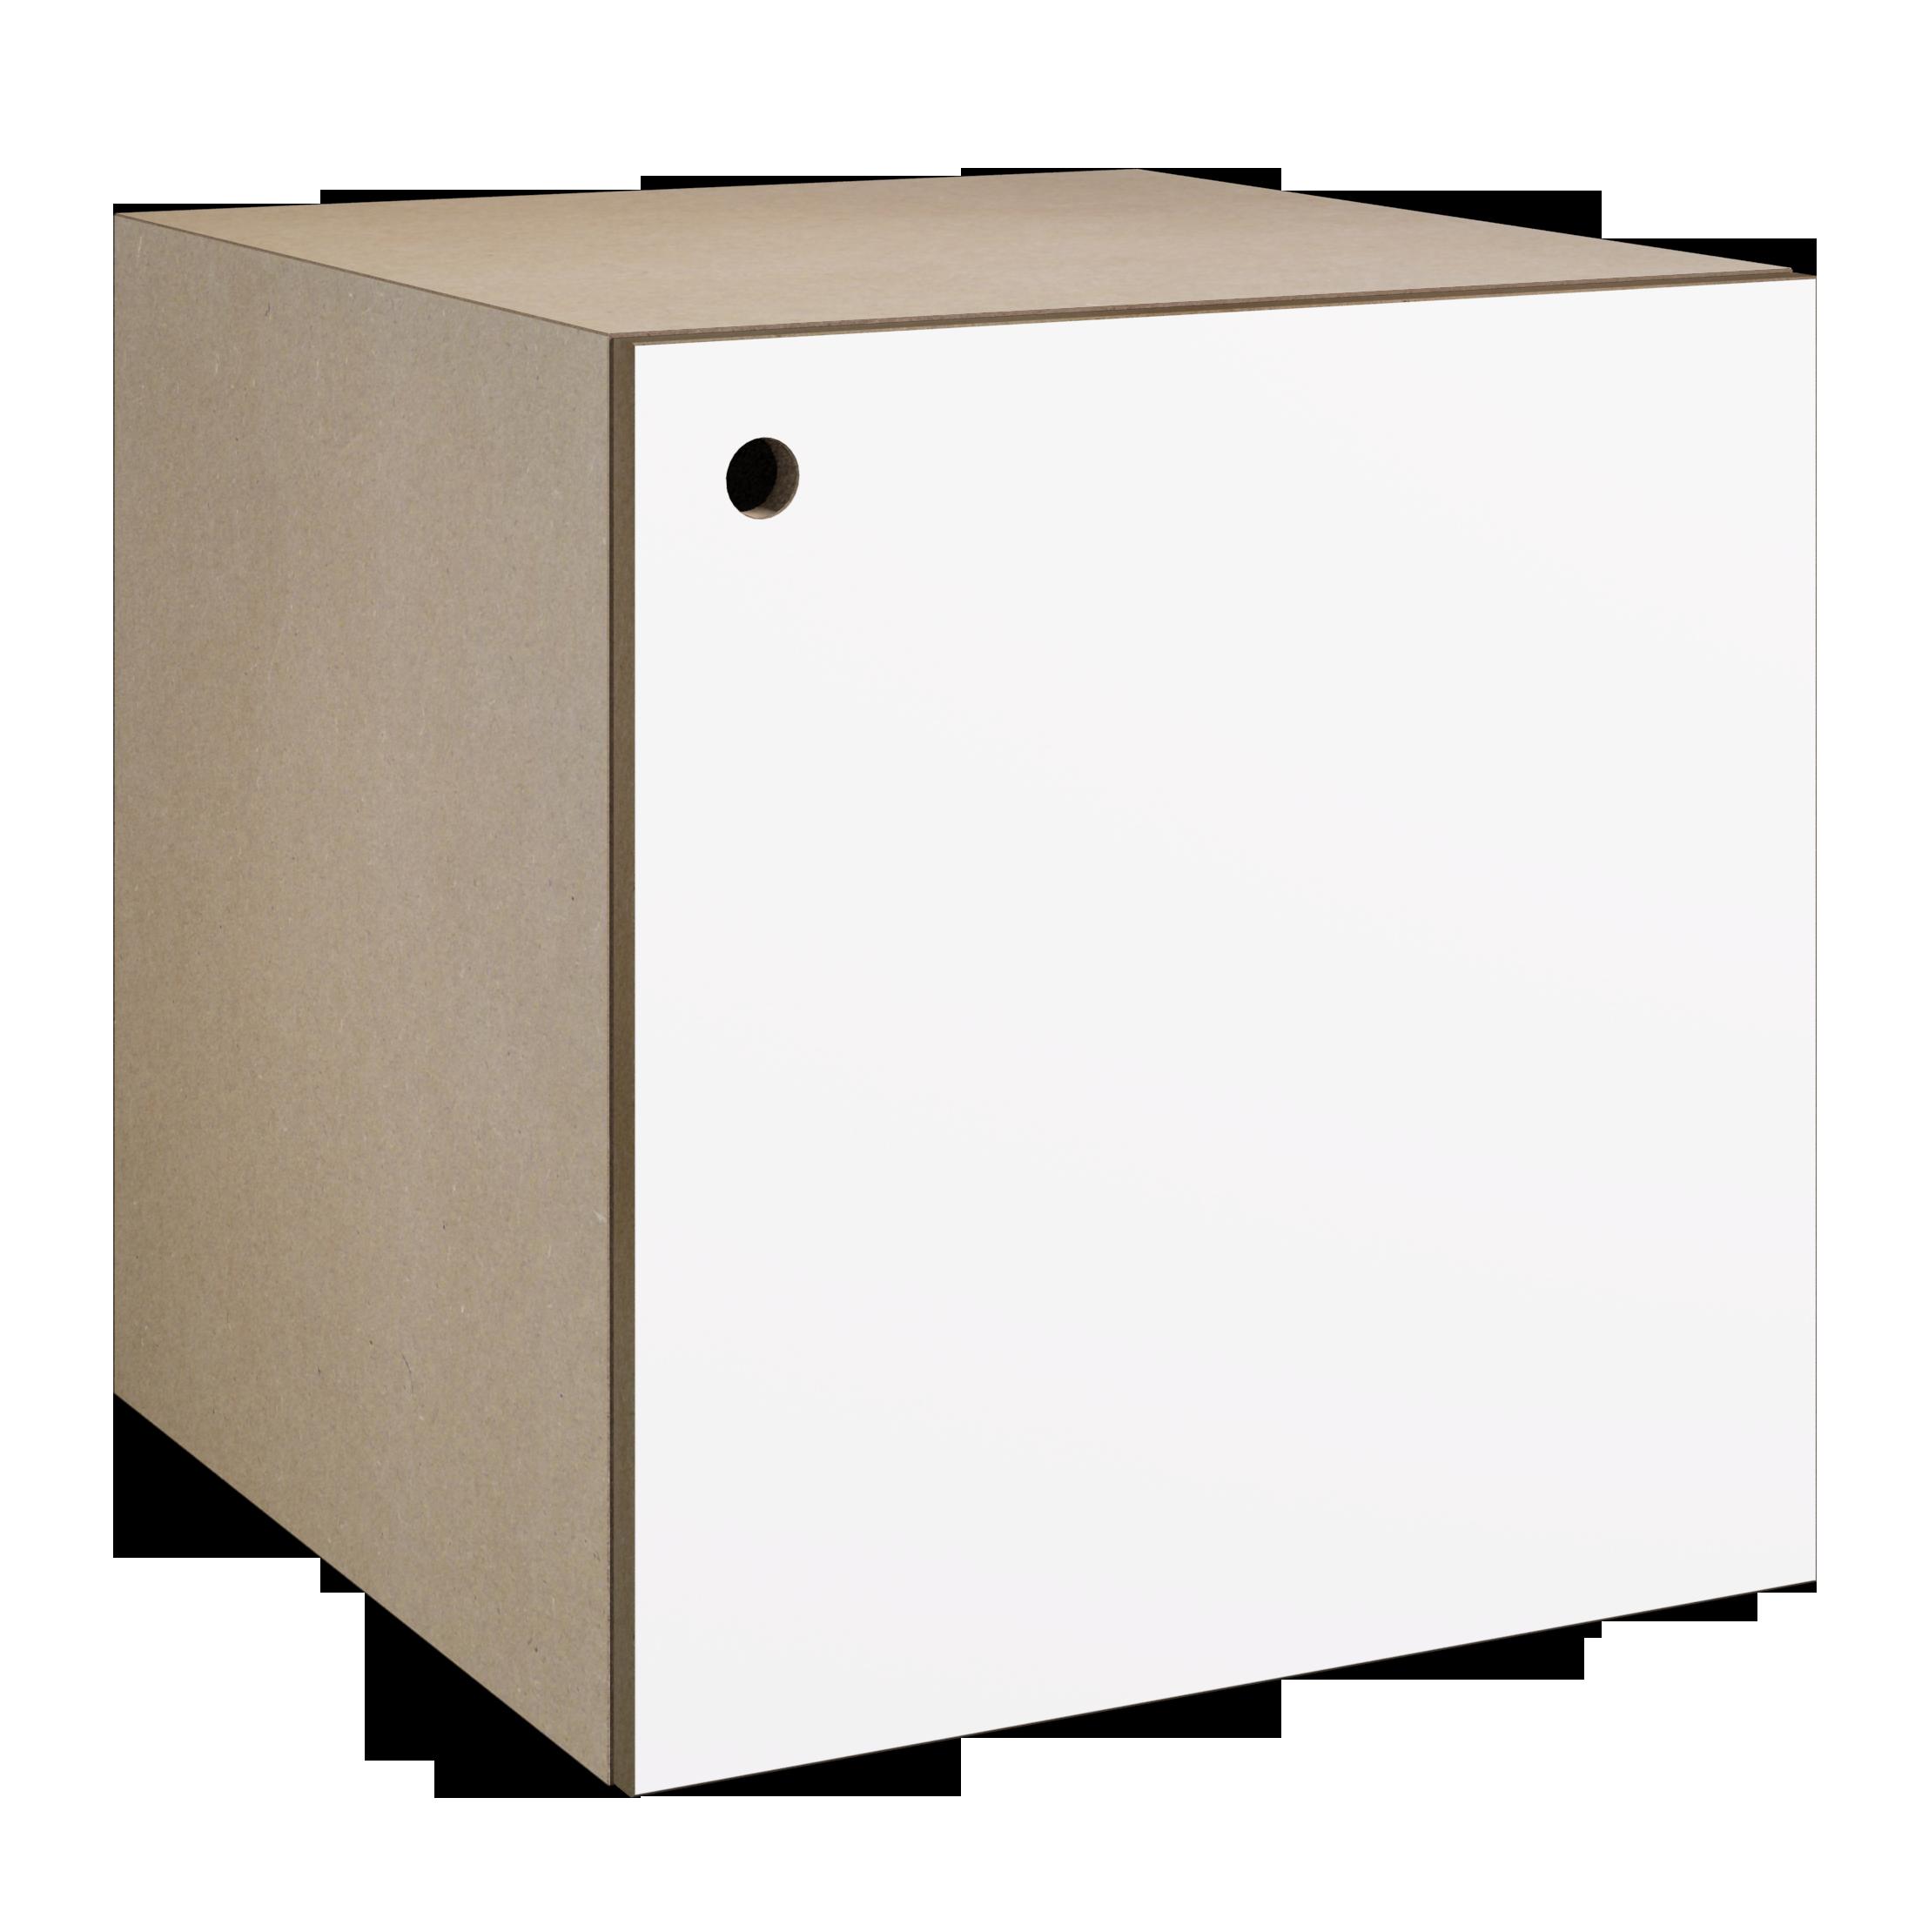 modul 1 1 natur mit t r stocubo regalsystem w rfelsystem w rfel w rfelregal regal schrank. Black Bedroom Furniture Sets. Home Design Ideas